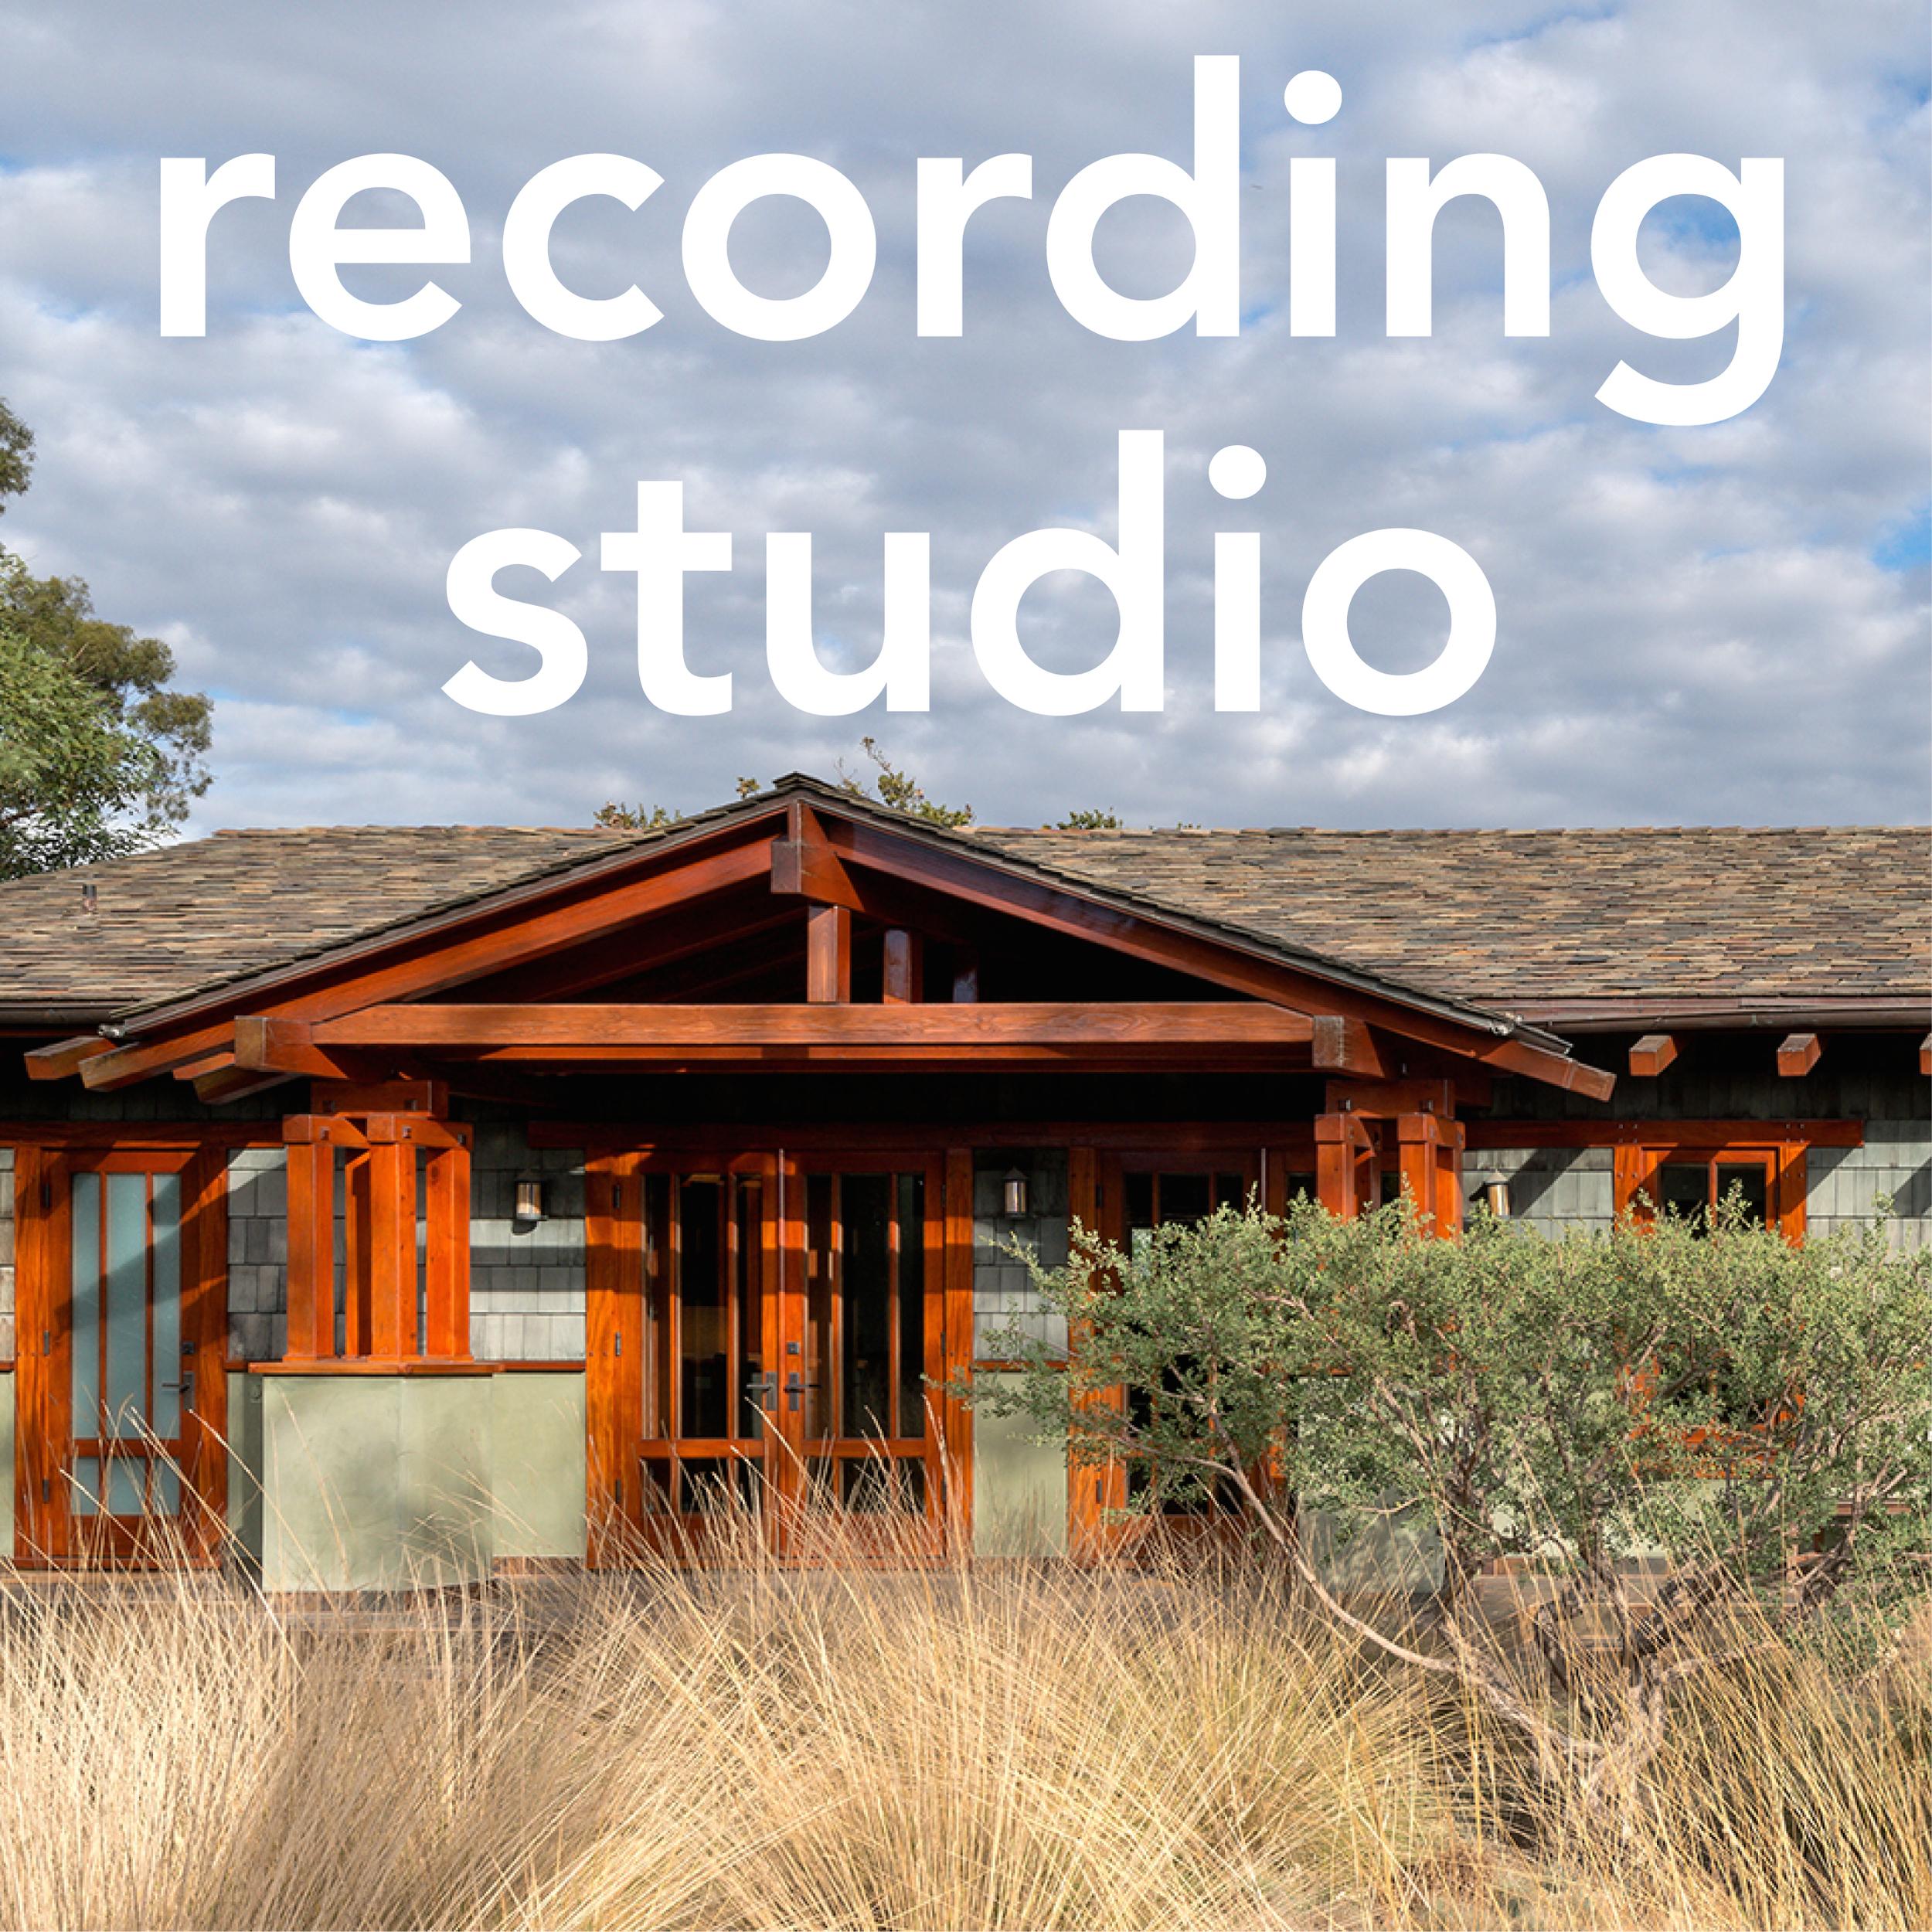 woodshed recording studio malibu ca - booking options - recording studio